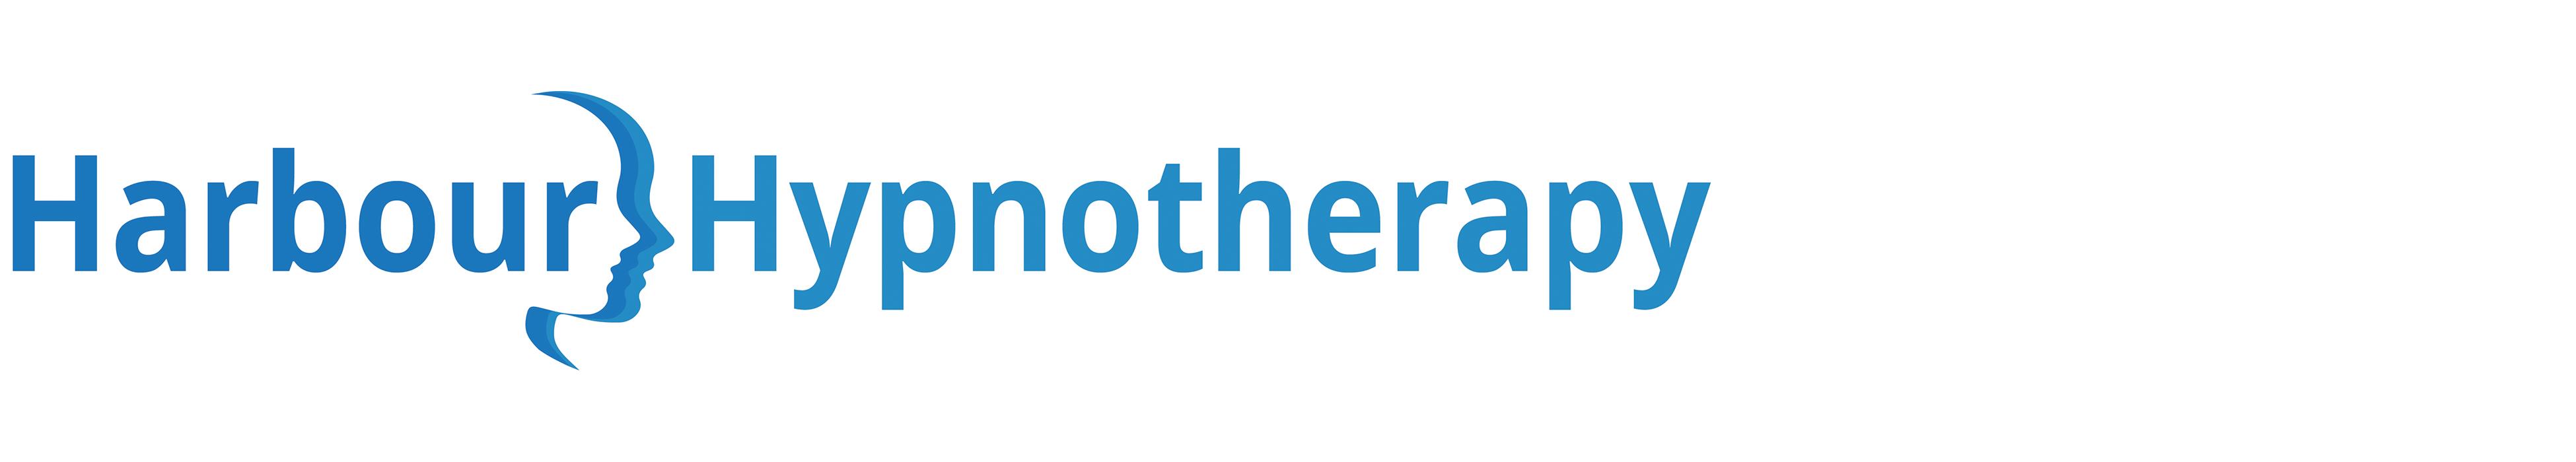 Sydney Hypnotherapy | Sydney Hypnotherapist | Hypnosis North Sydney